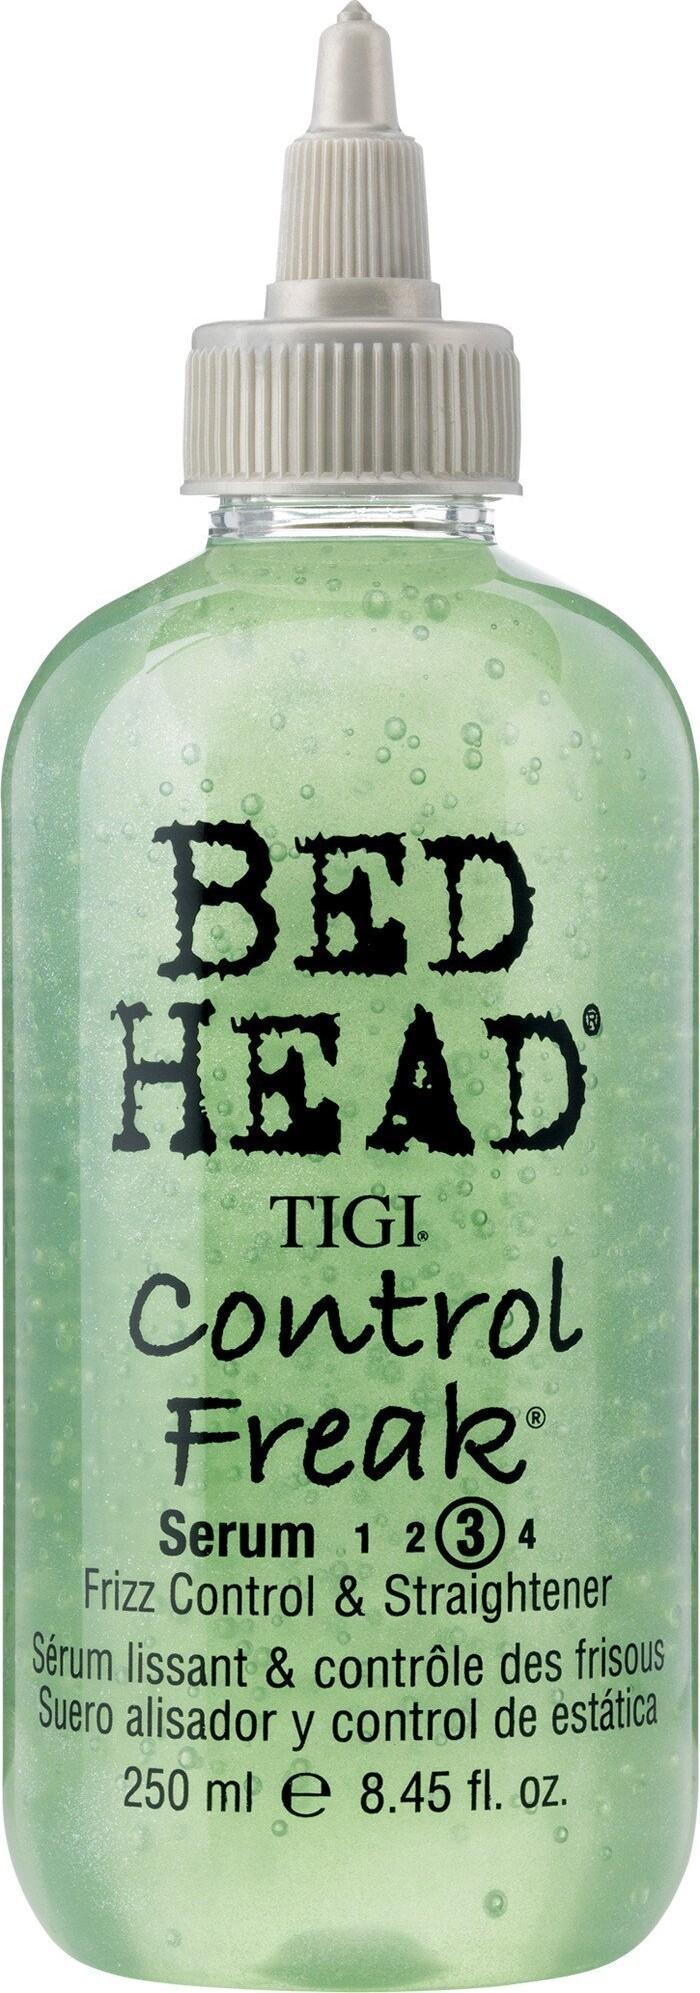 a9be1818665 Tigi Bed Head Control Freak Frizz Control Straightener Serum - 250 Ml